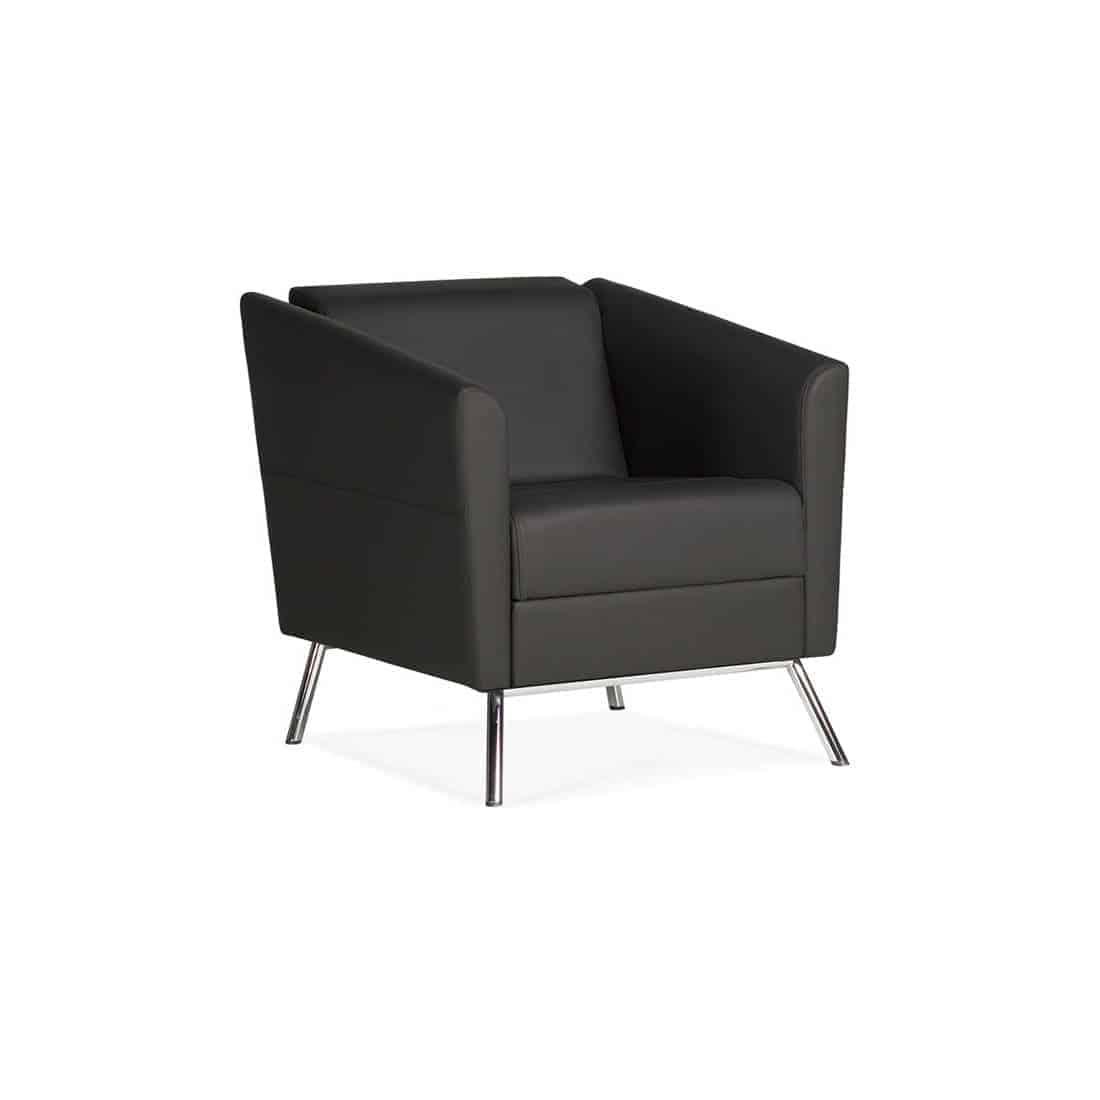 Global Wind Chair- Lounge Chair